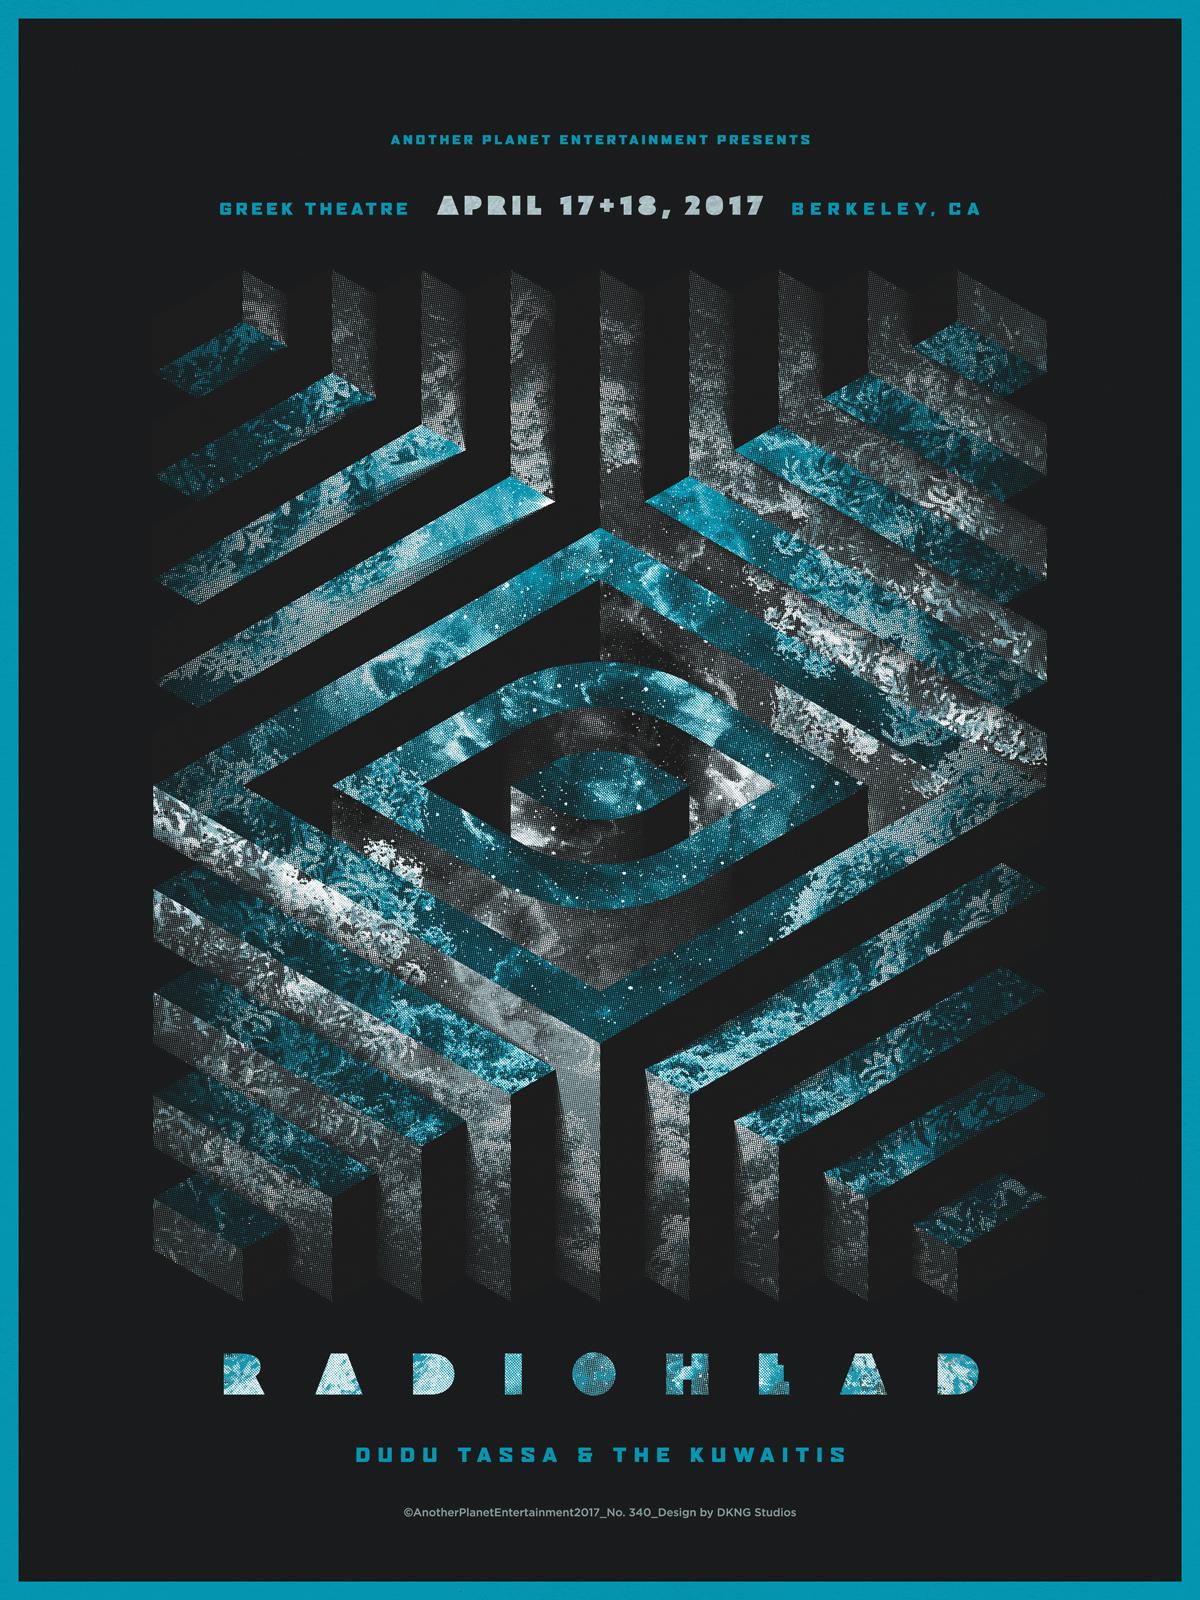 radiohead_blue.jpg